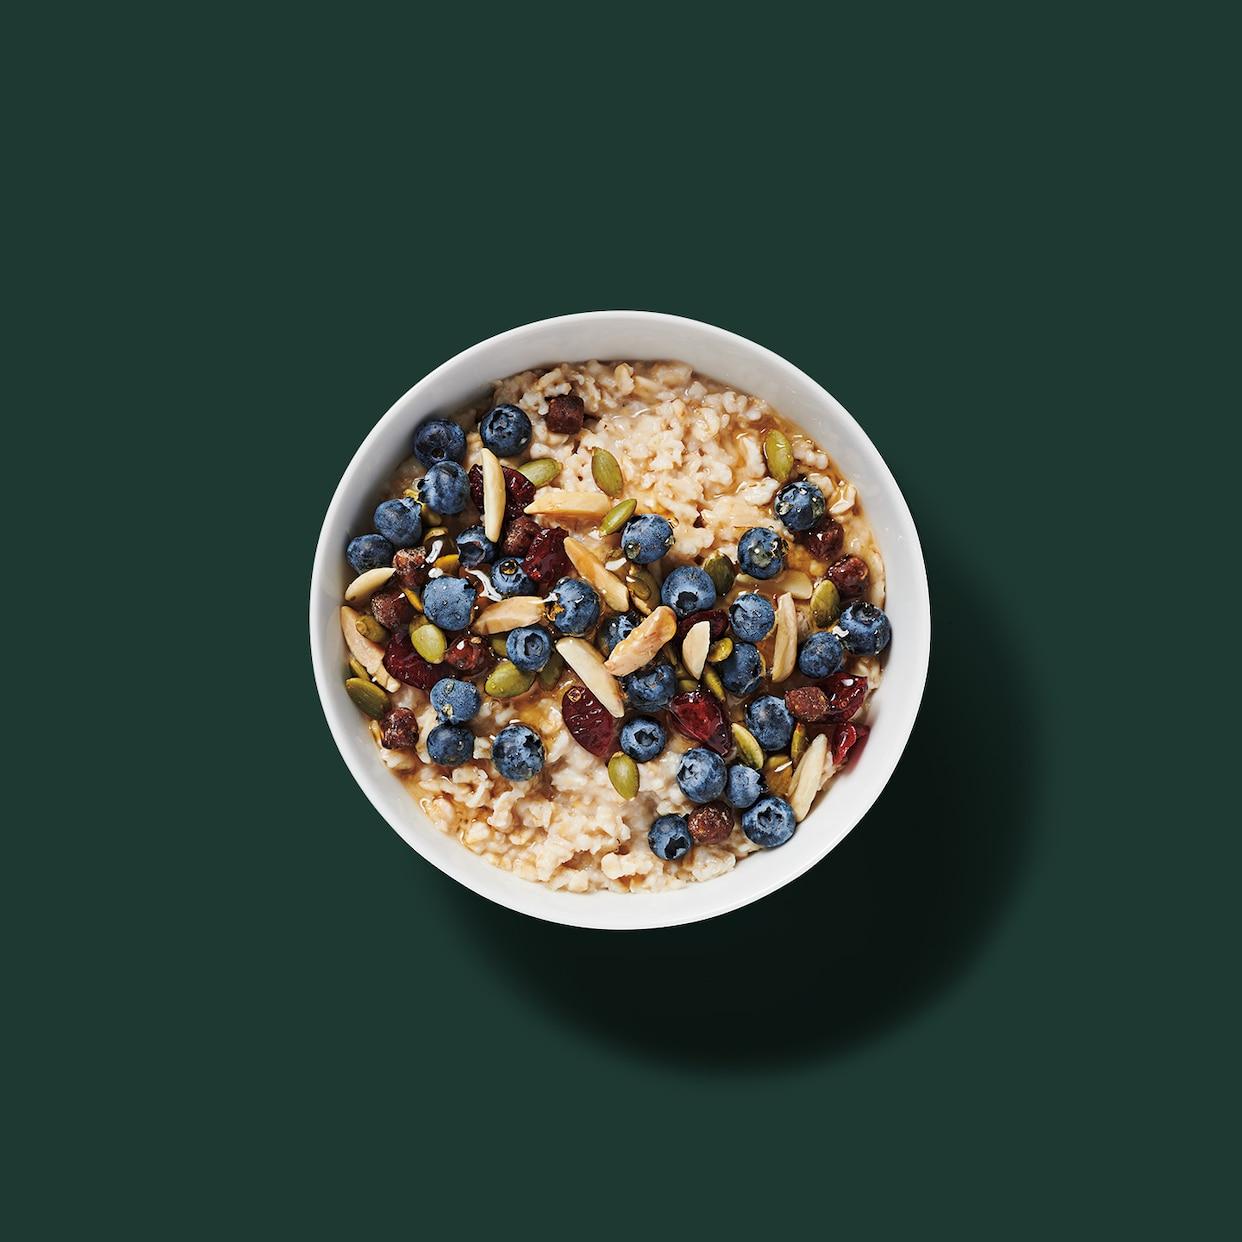 Hearty Blueberry Oatmeal: Starbucks